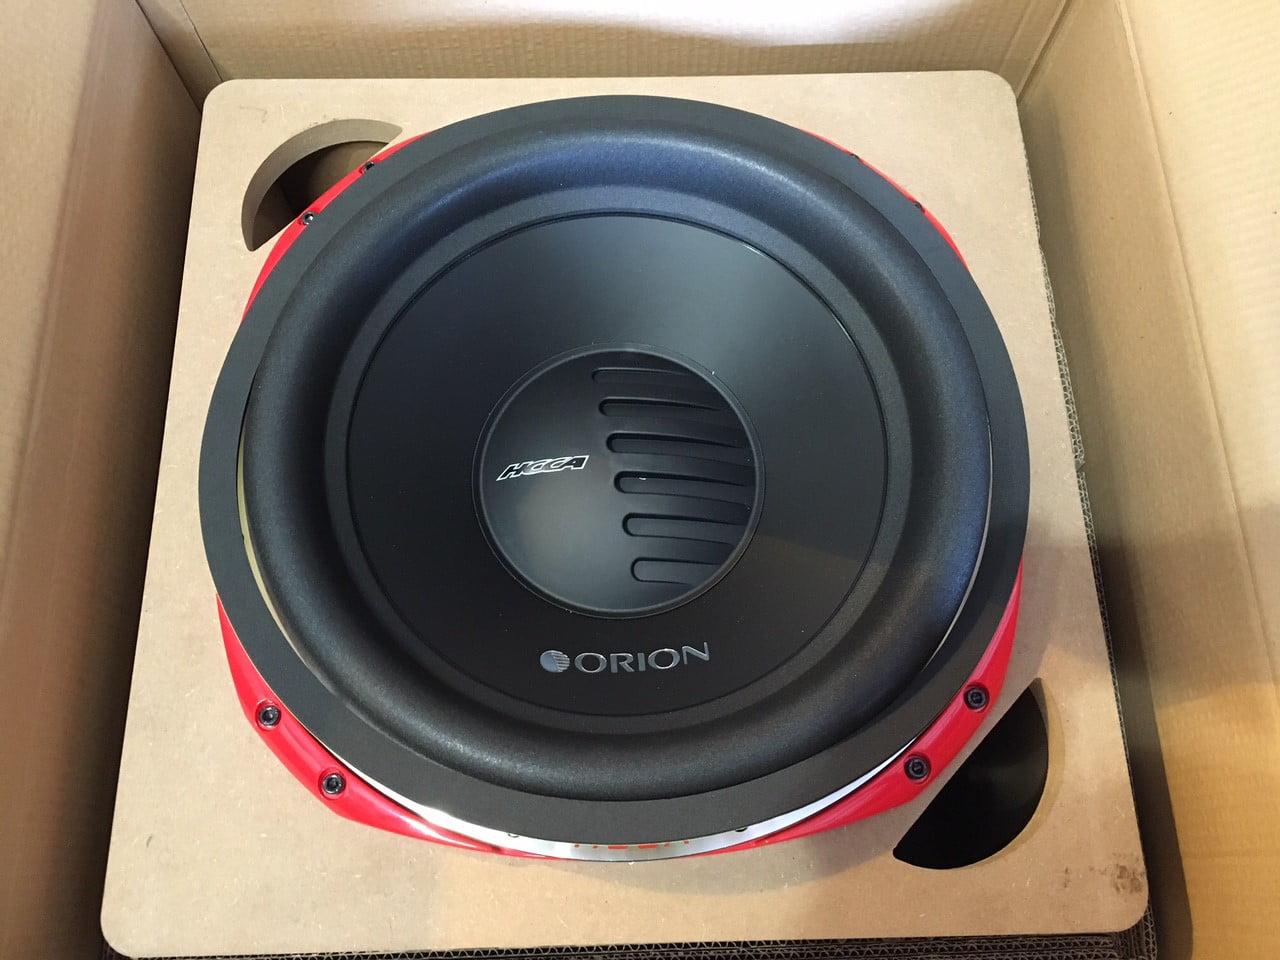 Orion HCCA152SPL 15 Inch 10,000 Watt Max Power SPL Dual 2 Ohm Competition  Subwoofer - Walmart.com